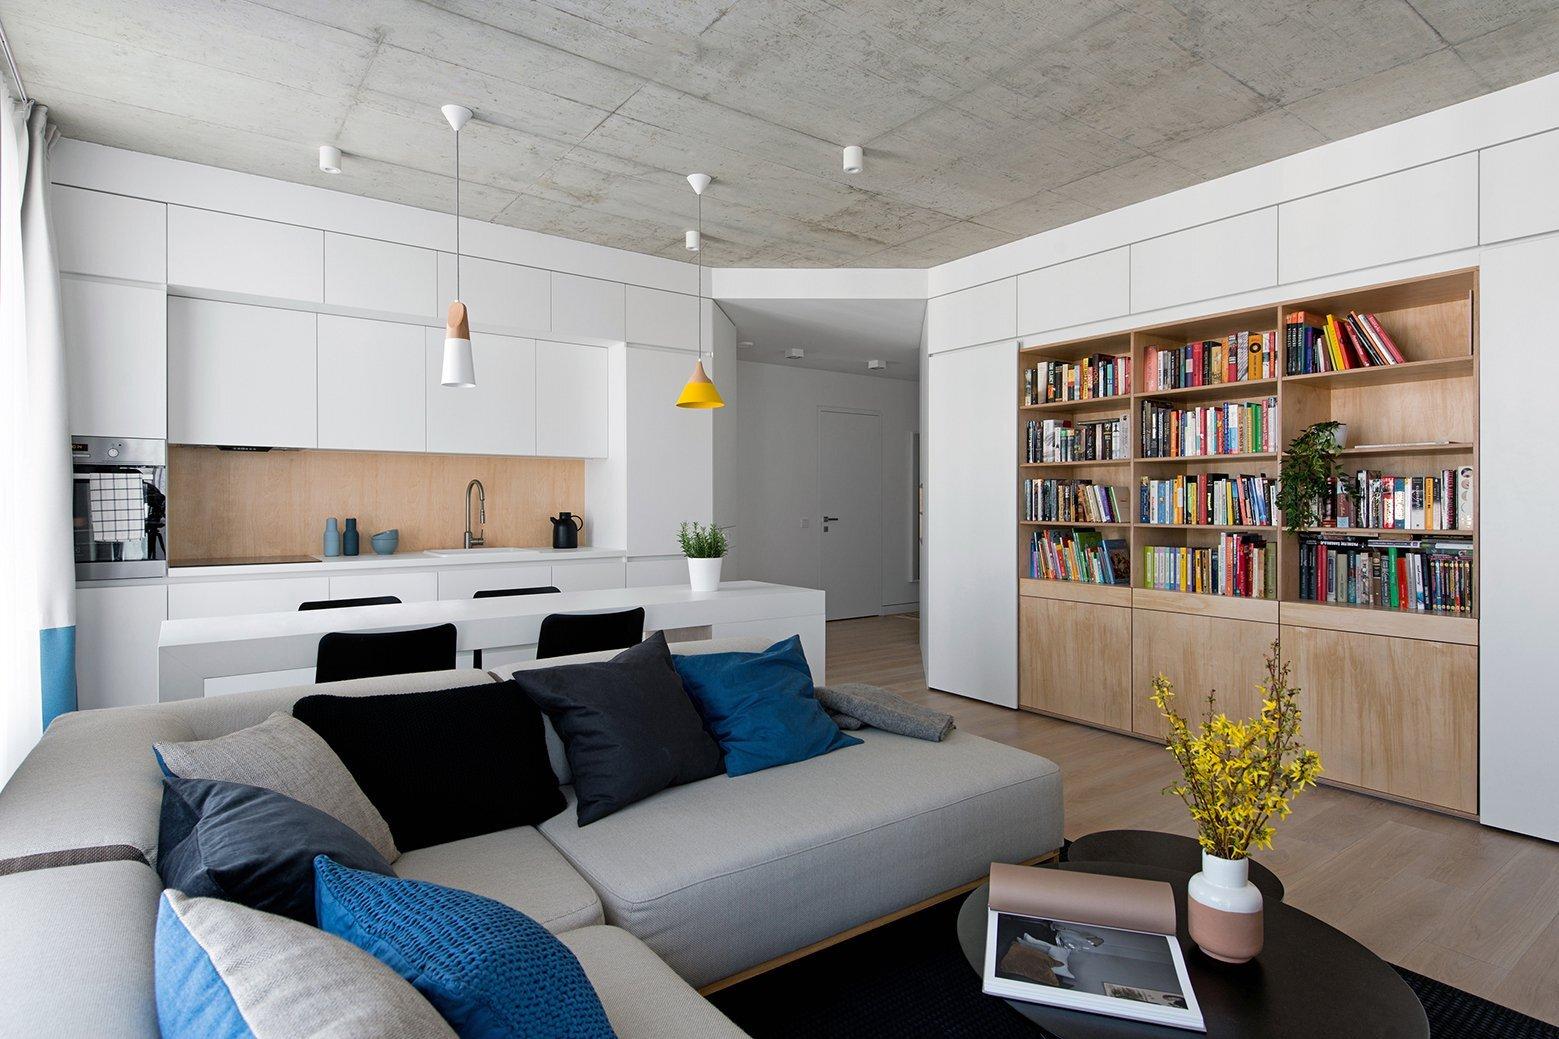 Apartment in Vilnius - Normundas Vilkas - Lithuania - Living Area - Humble Homes